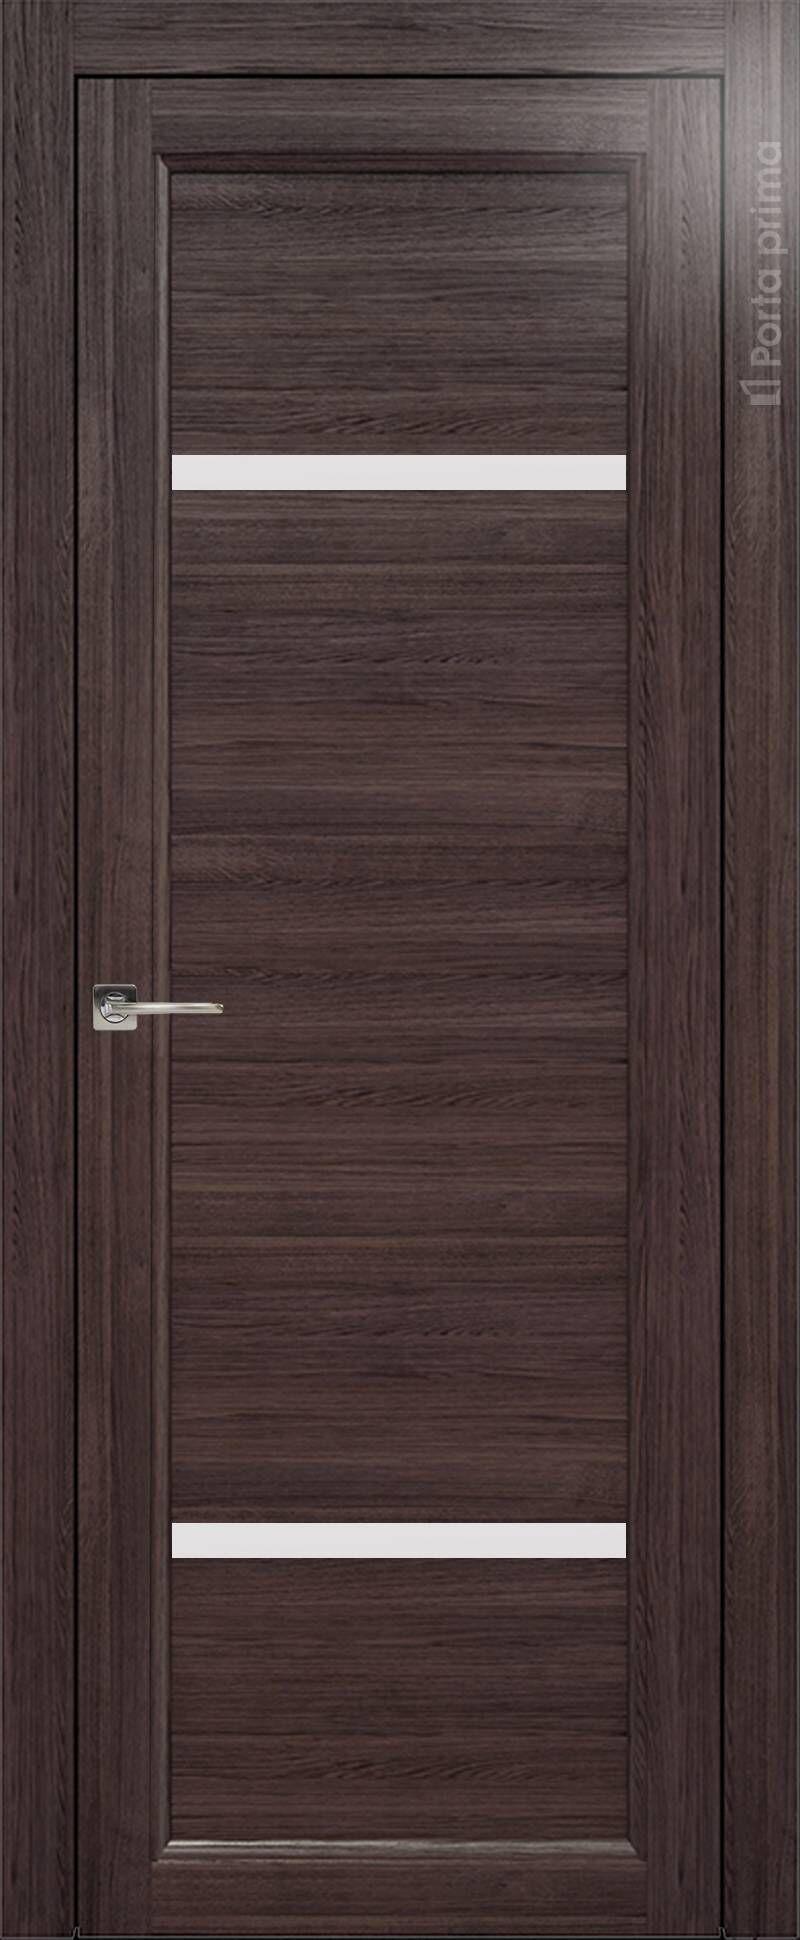 Sorrento-R Г3 цвет - Венге Нуар Без стекла (ДГ)